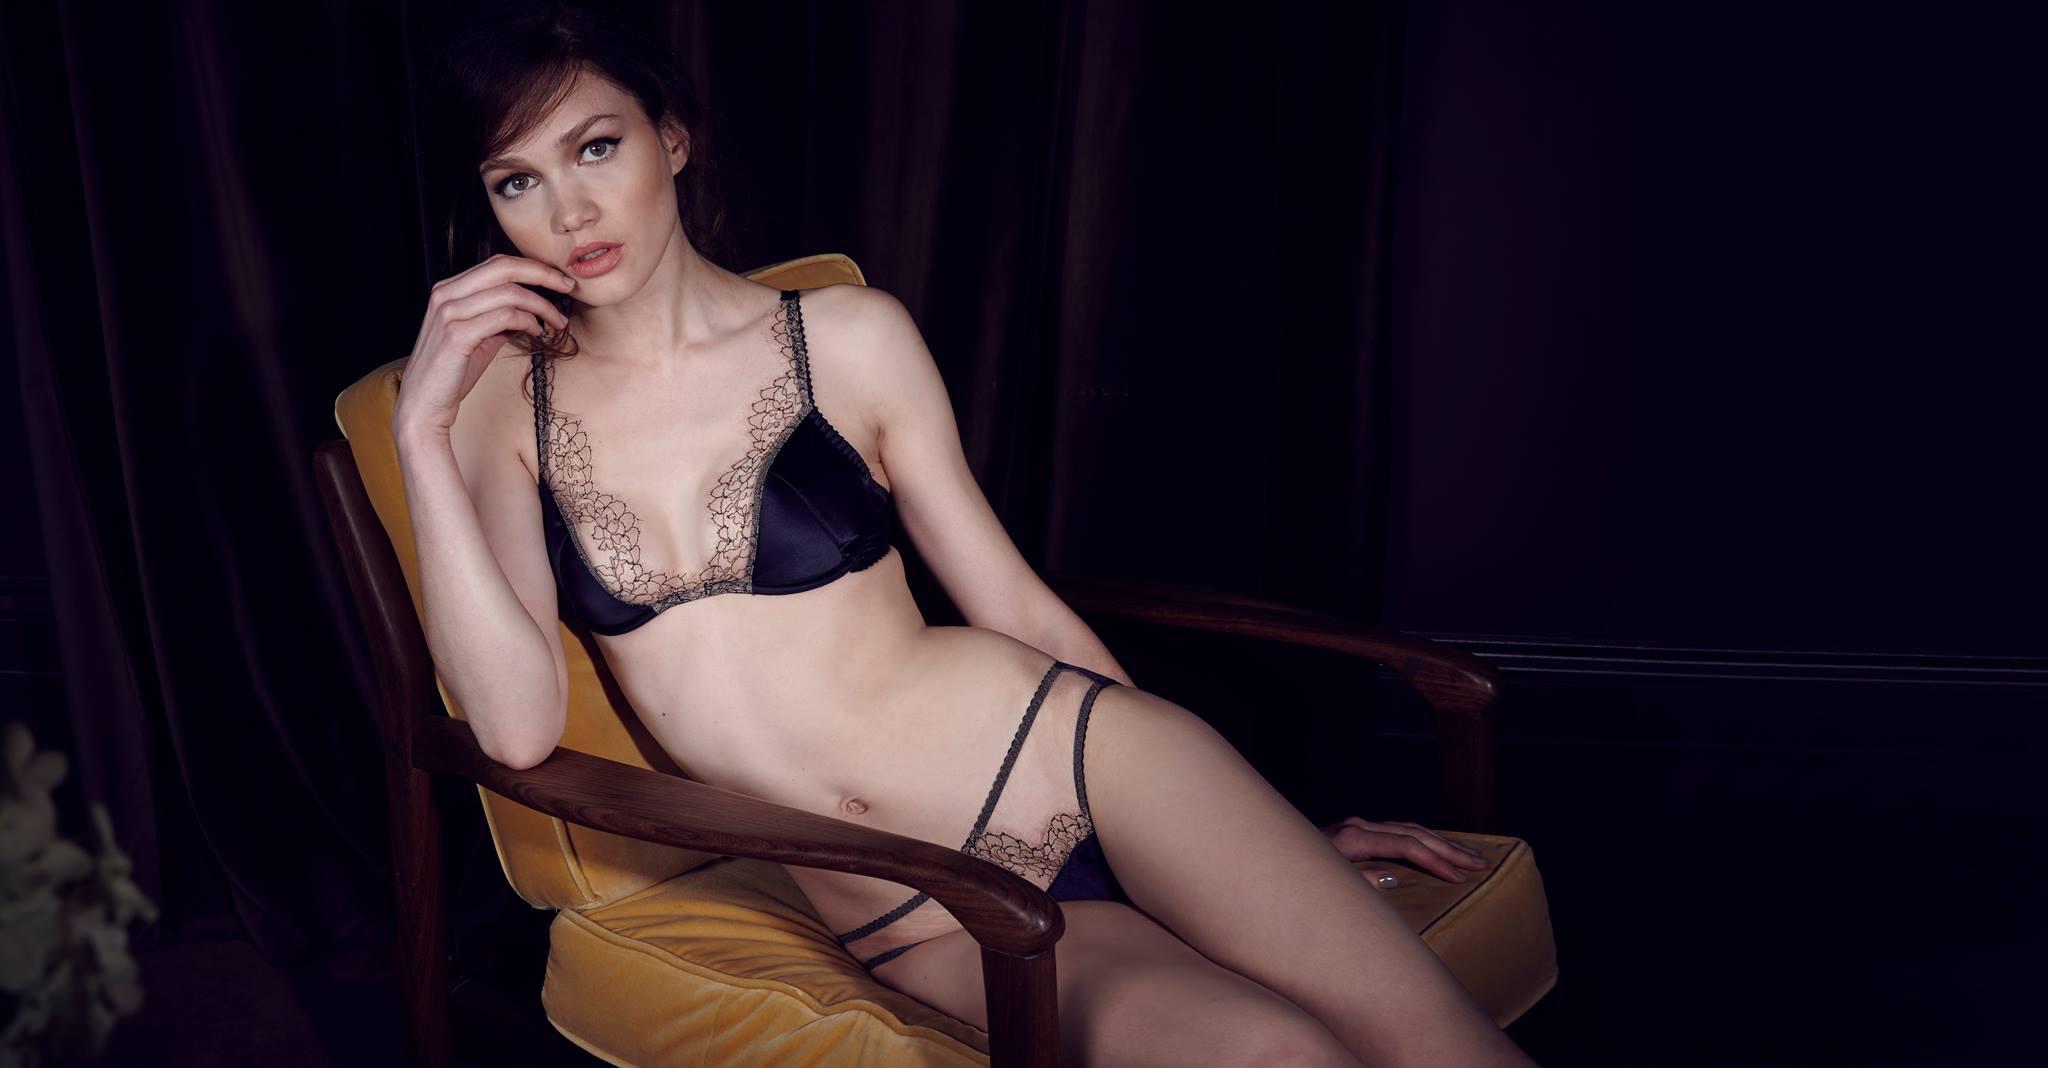 Fleur of England, Desire lingerie